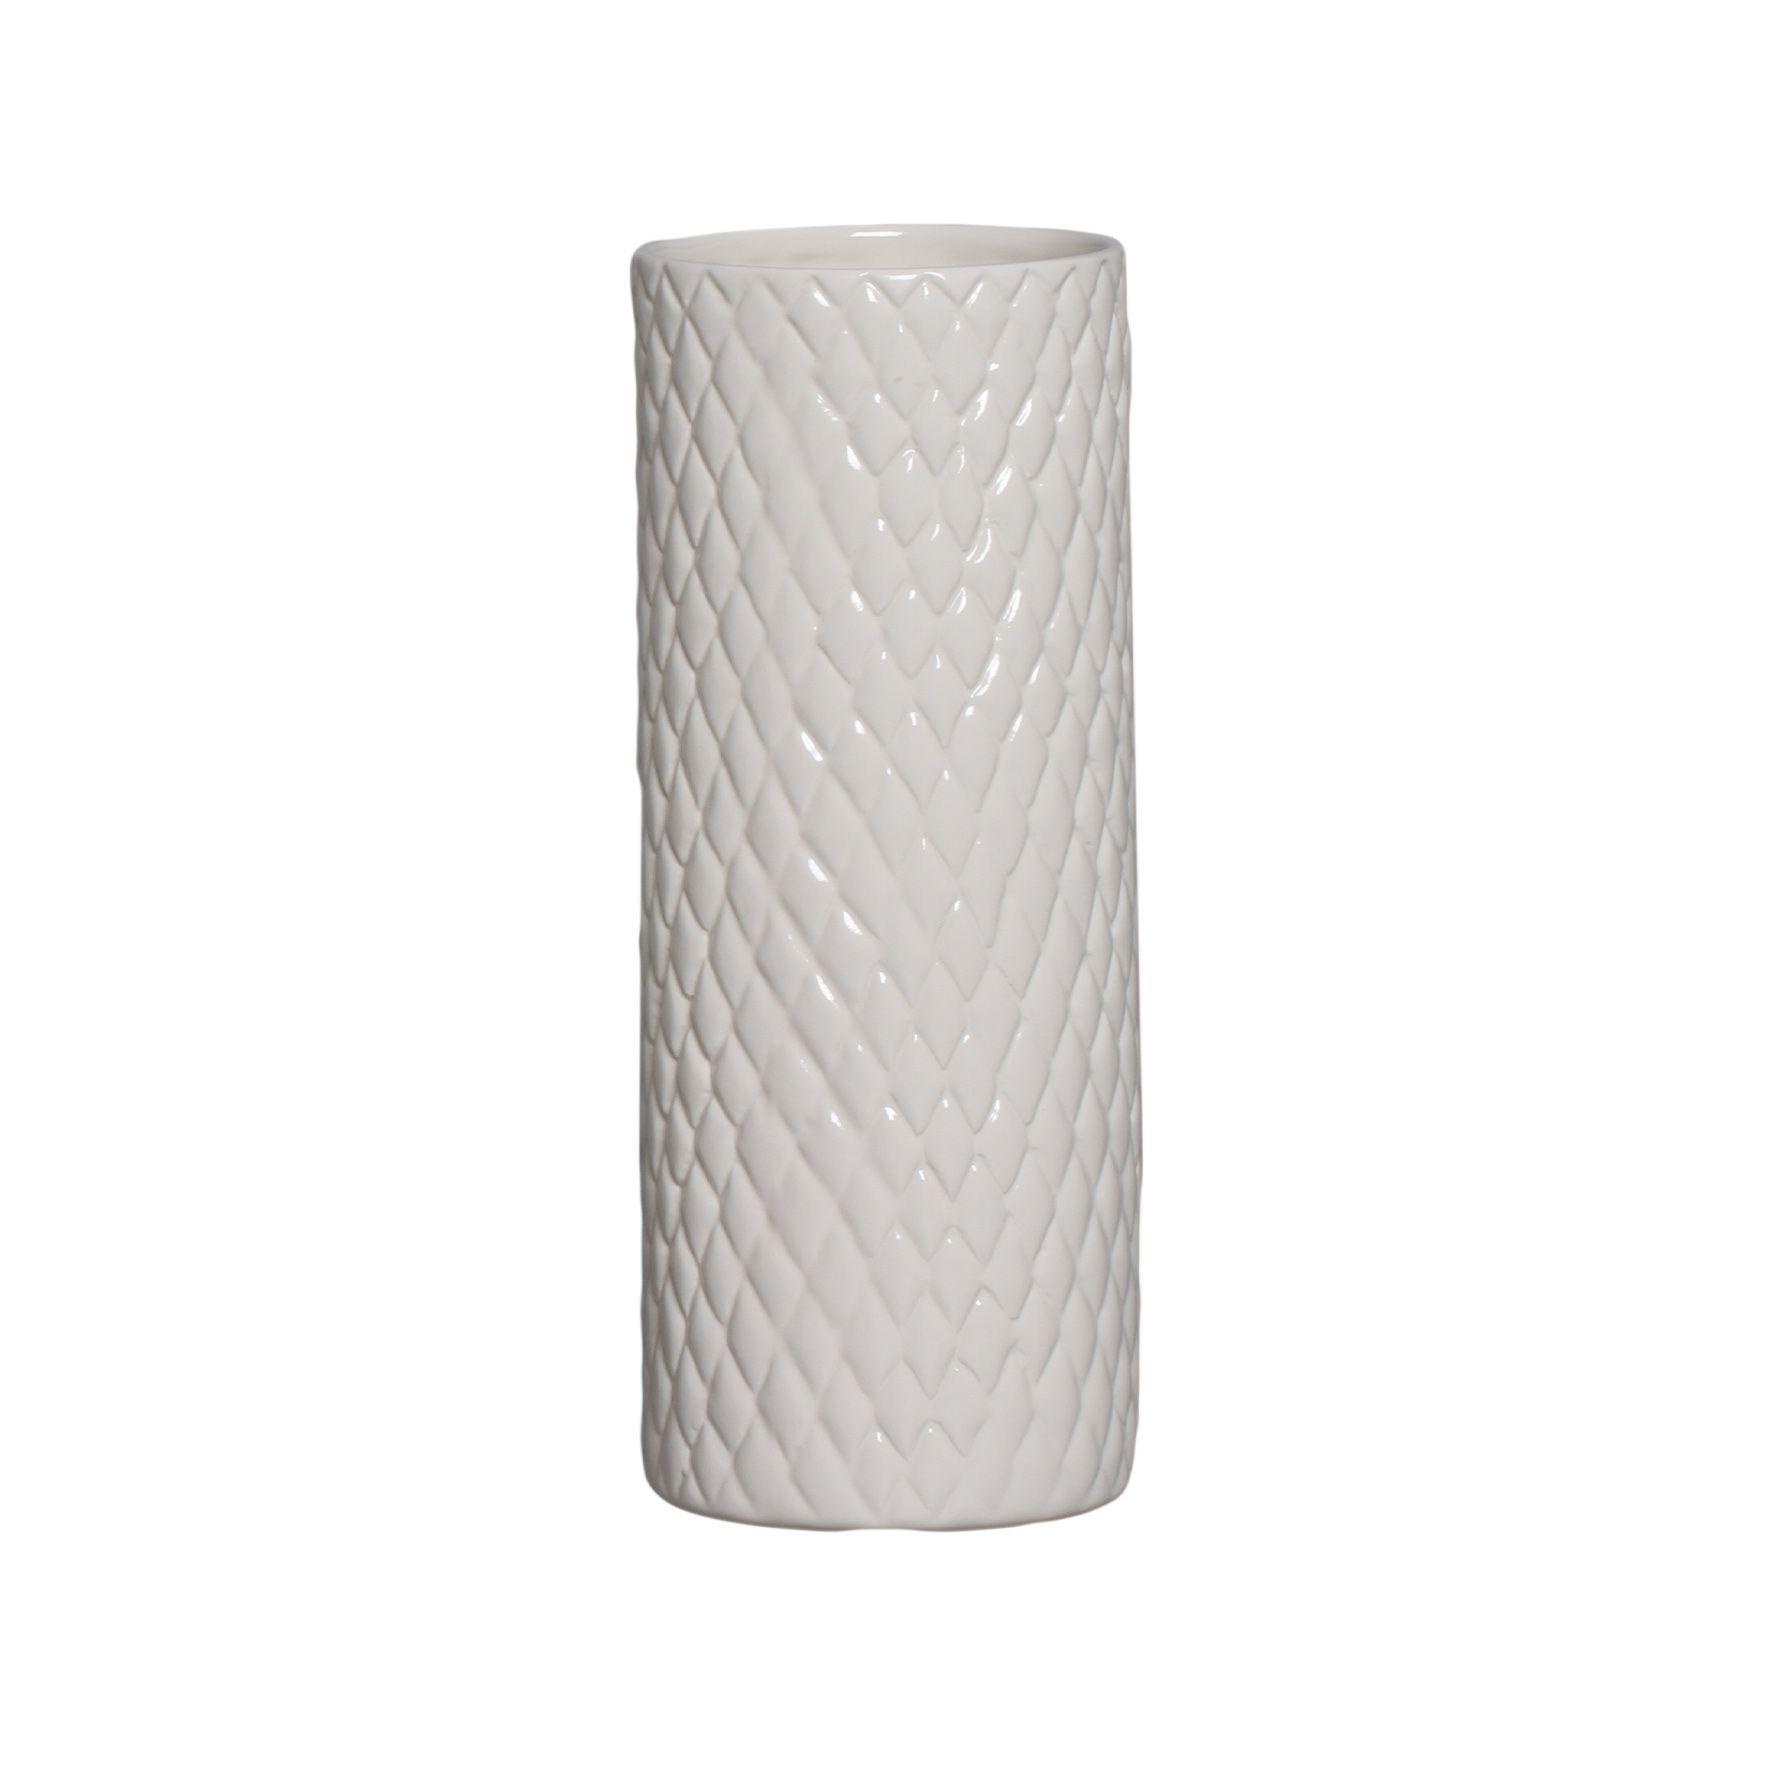 Cachepot de Cerâmica Crema Claro 32,7 x 12,7 cm